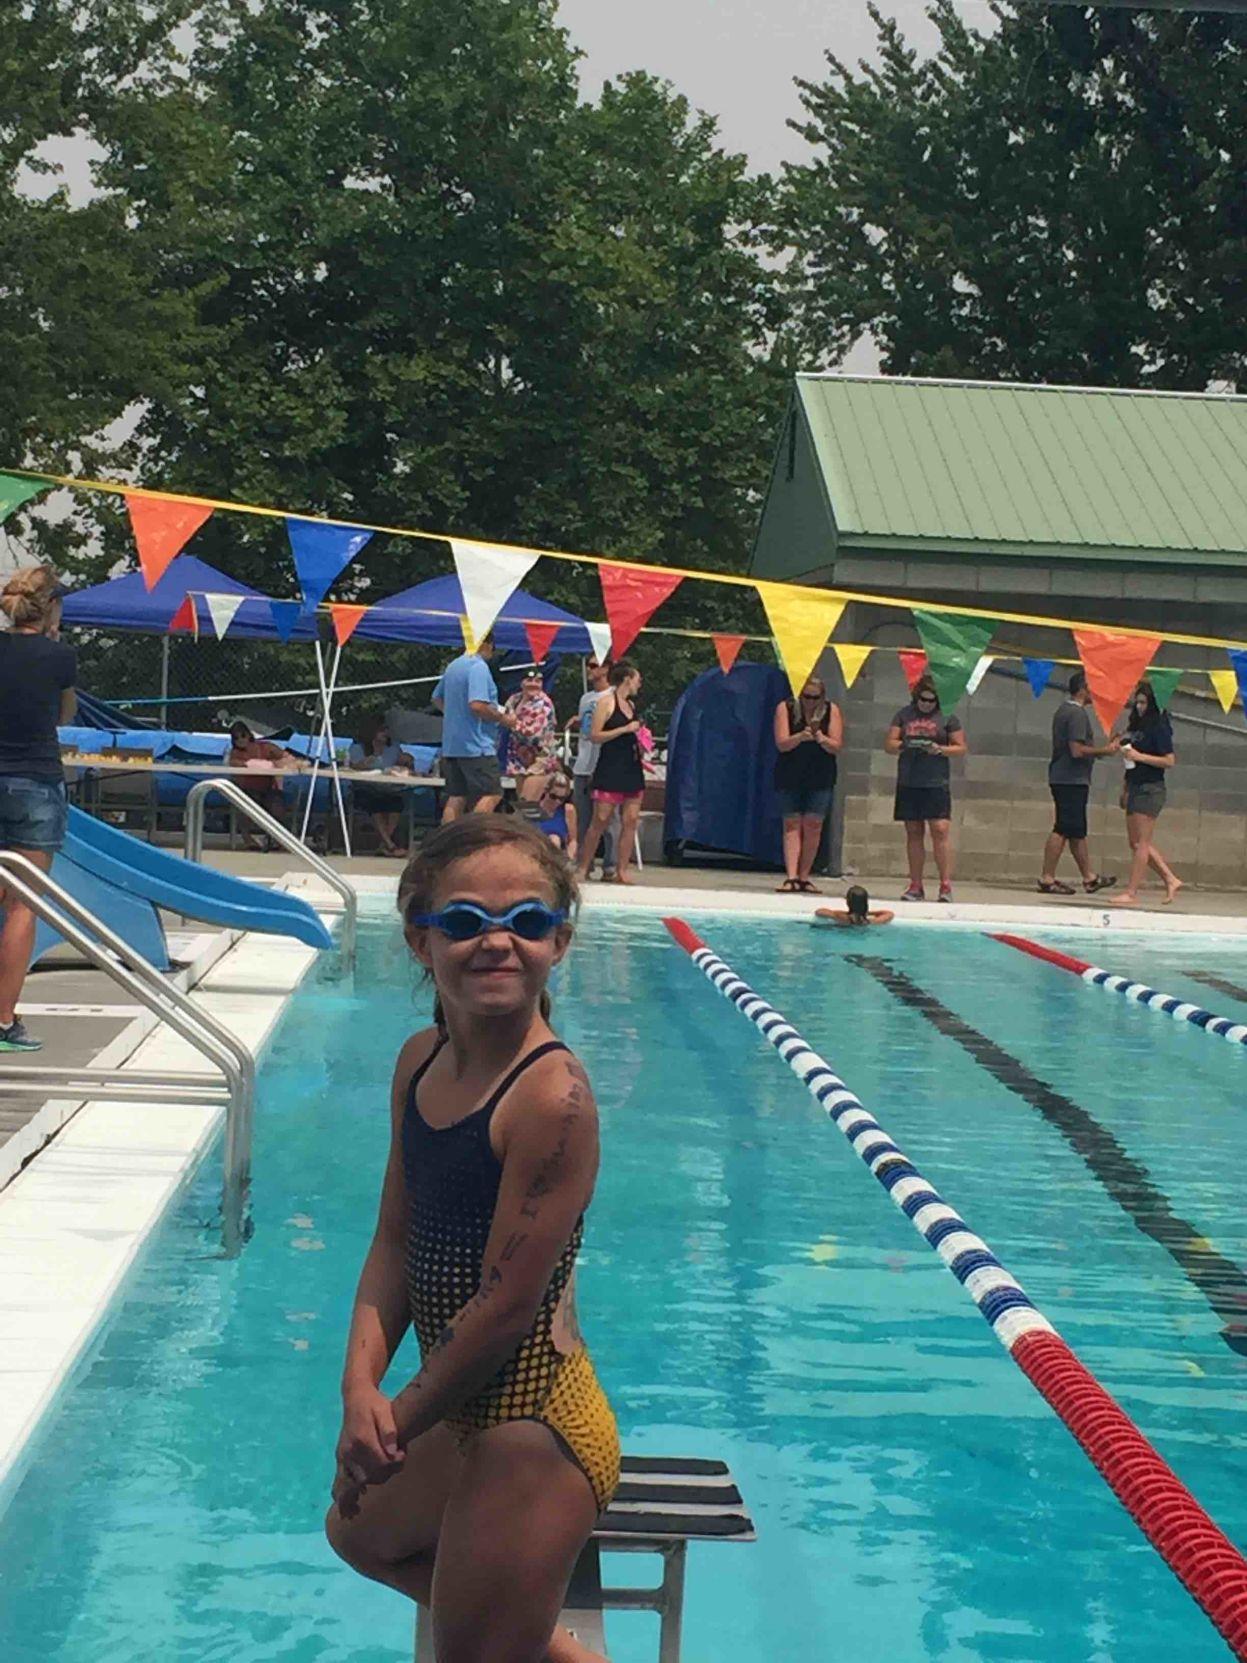 Nezperce swim team